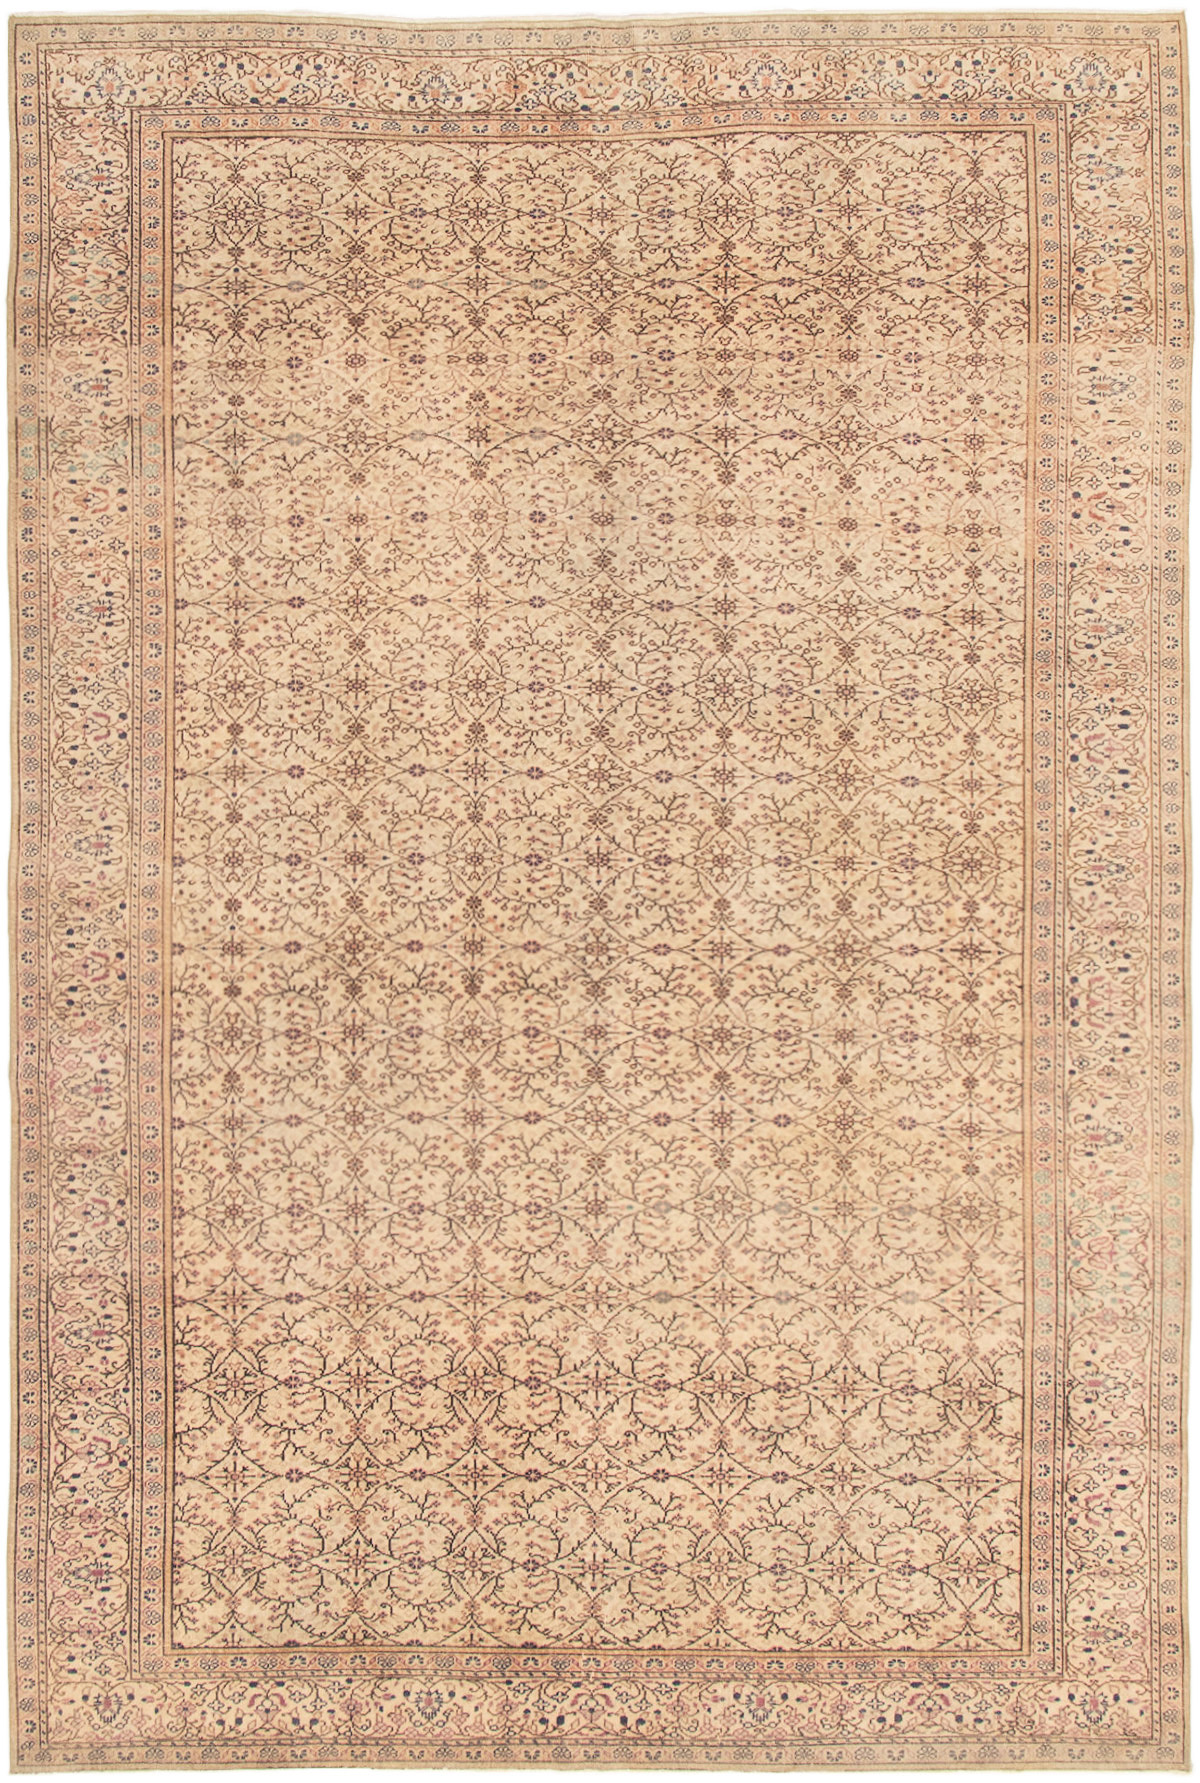 "Hand-knotted Antalya Vintage Cream Wool Rug 5'11"" x 9'6""  Size: 5'11"" x 9'6"""